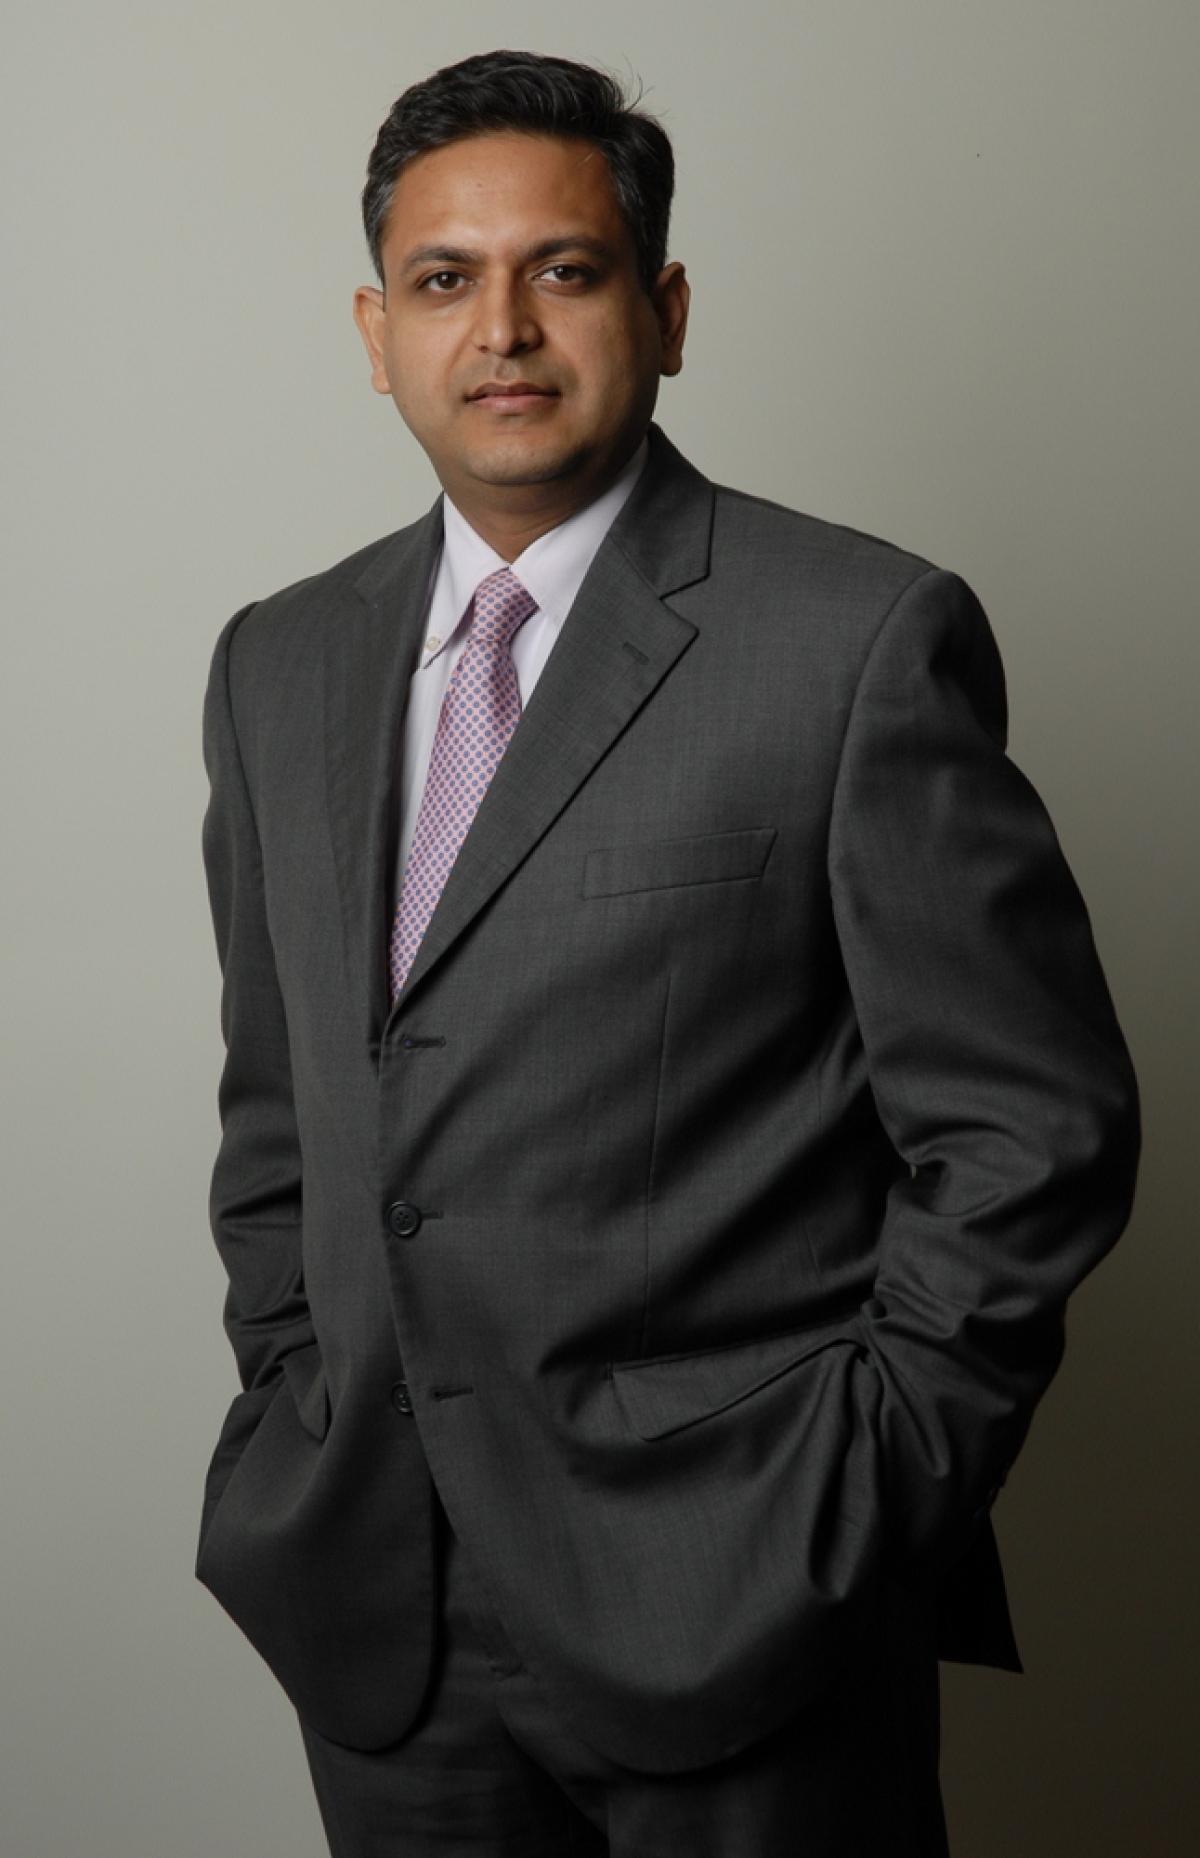 Conversation with Rabindra Jhunjhunwala, Partner at Khaitan & Co